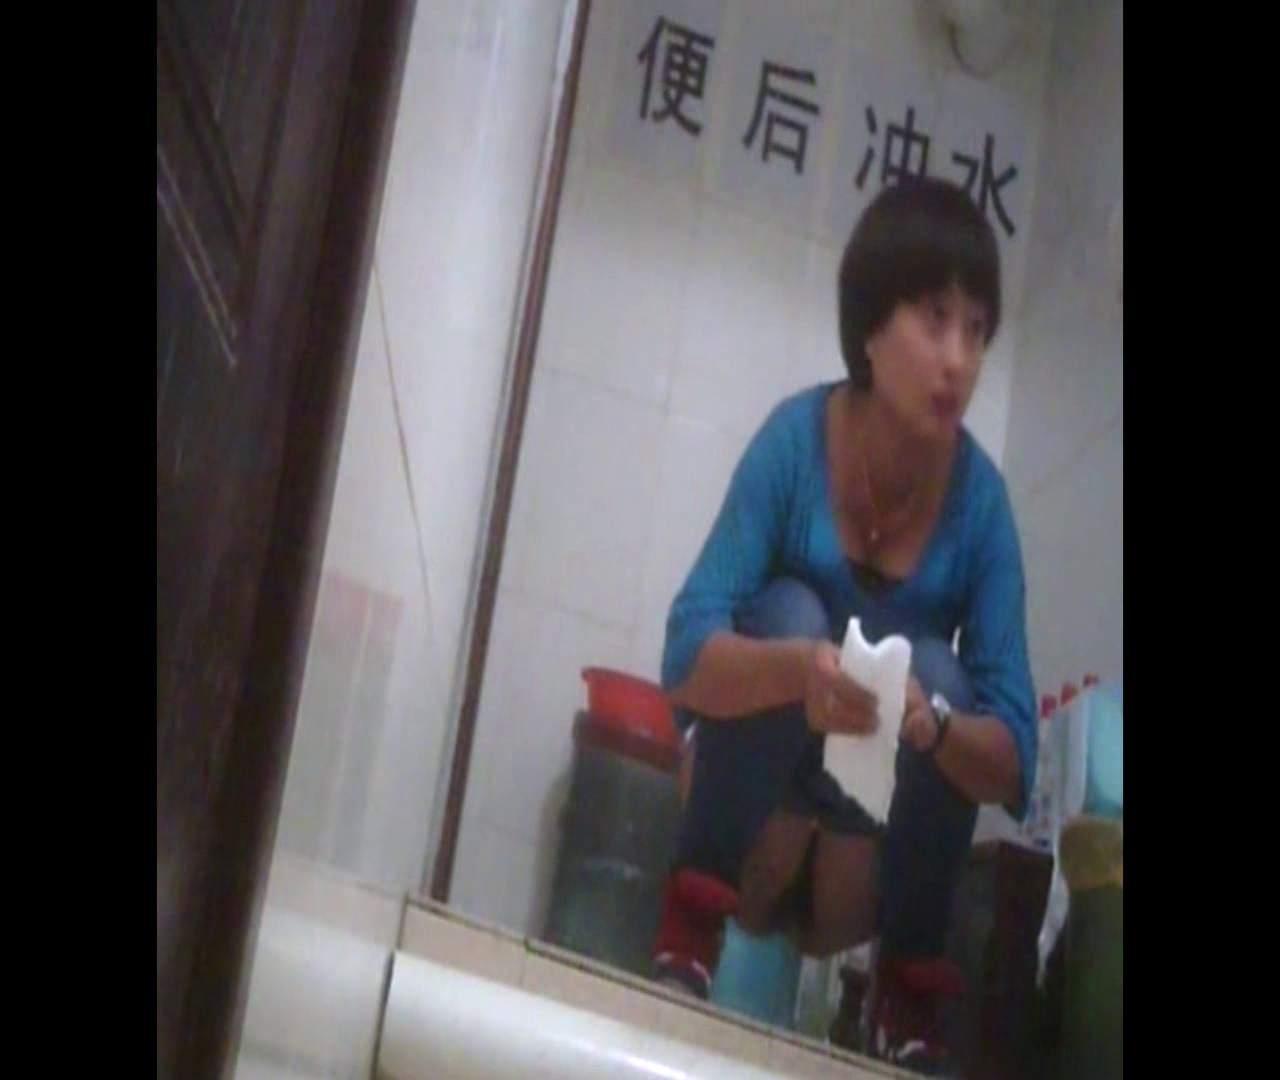 Vol.37 豊満な胸を持つマッシュルームカットな彼女 洗面所 盗撮おめこ無修正動画無料 60pic 26